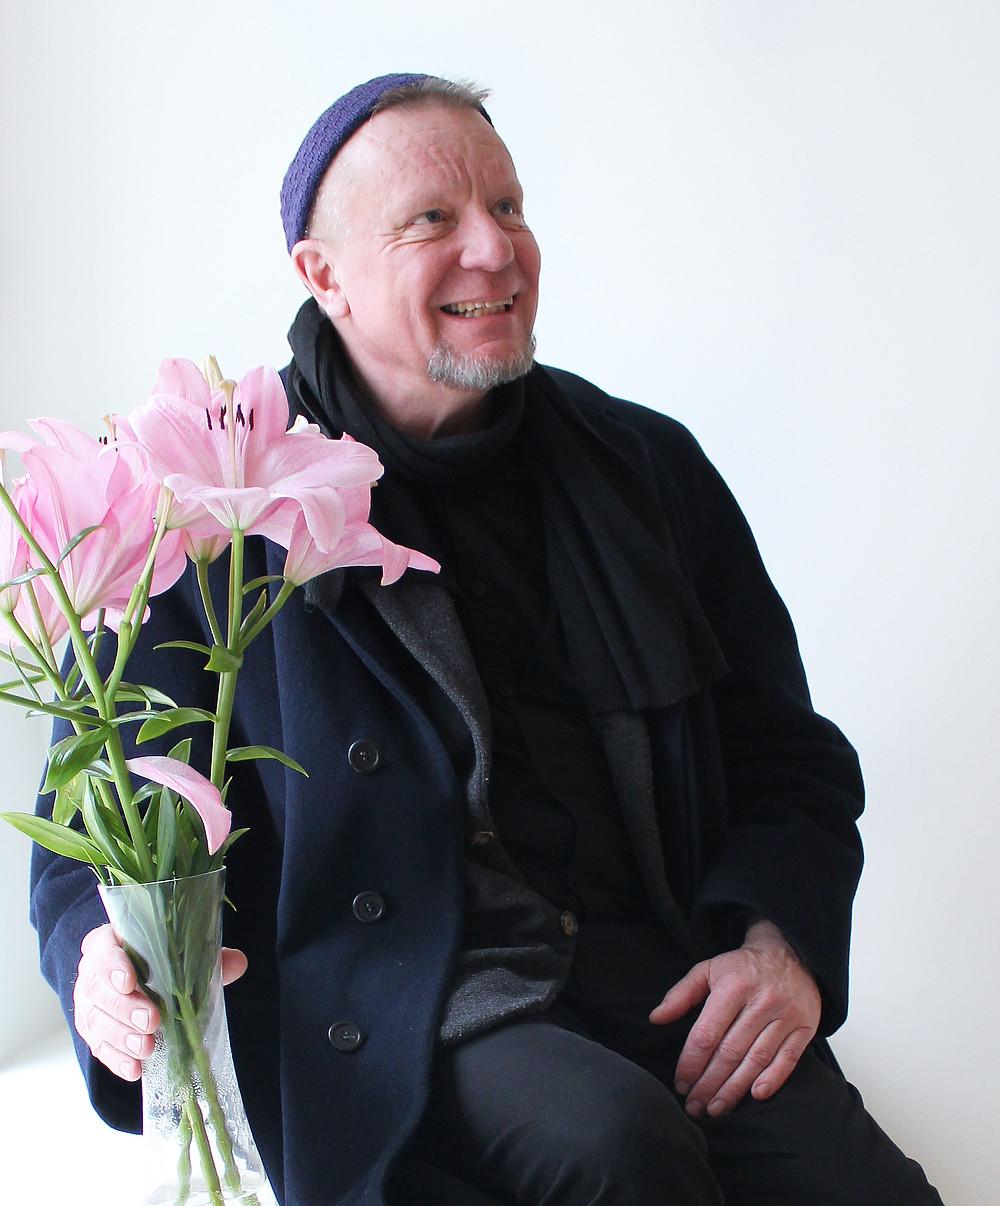 Yngve Brothén